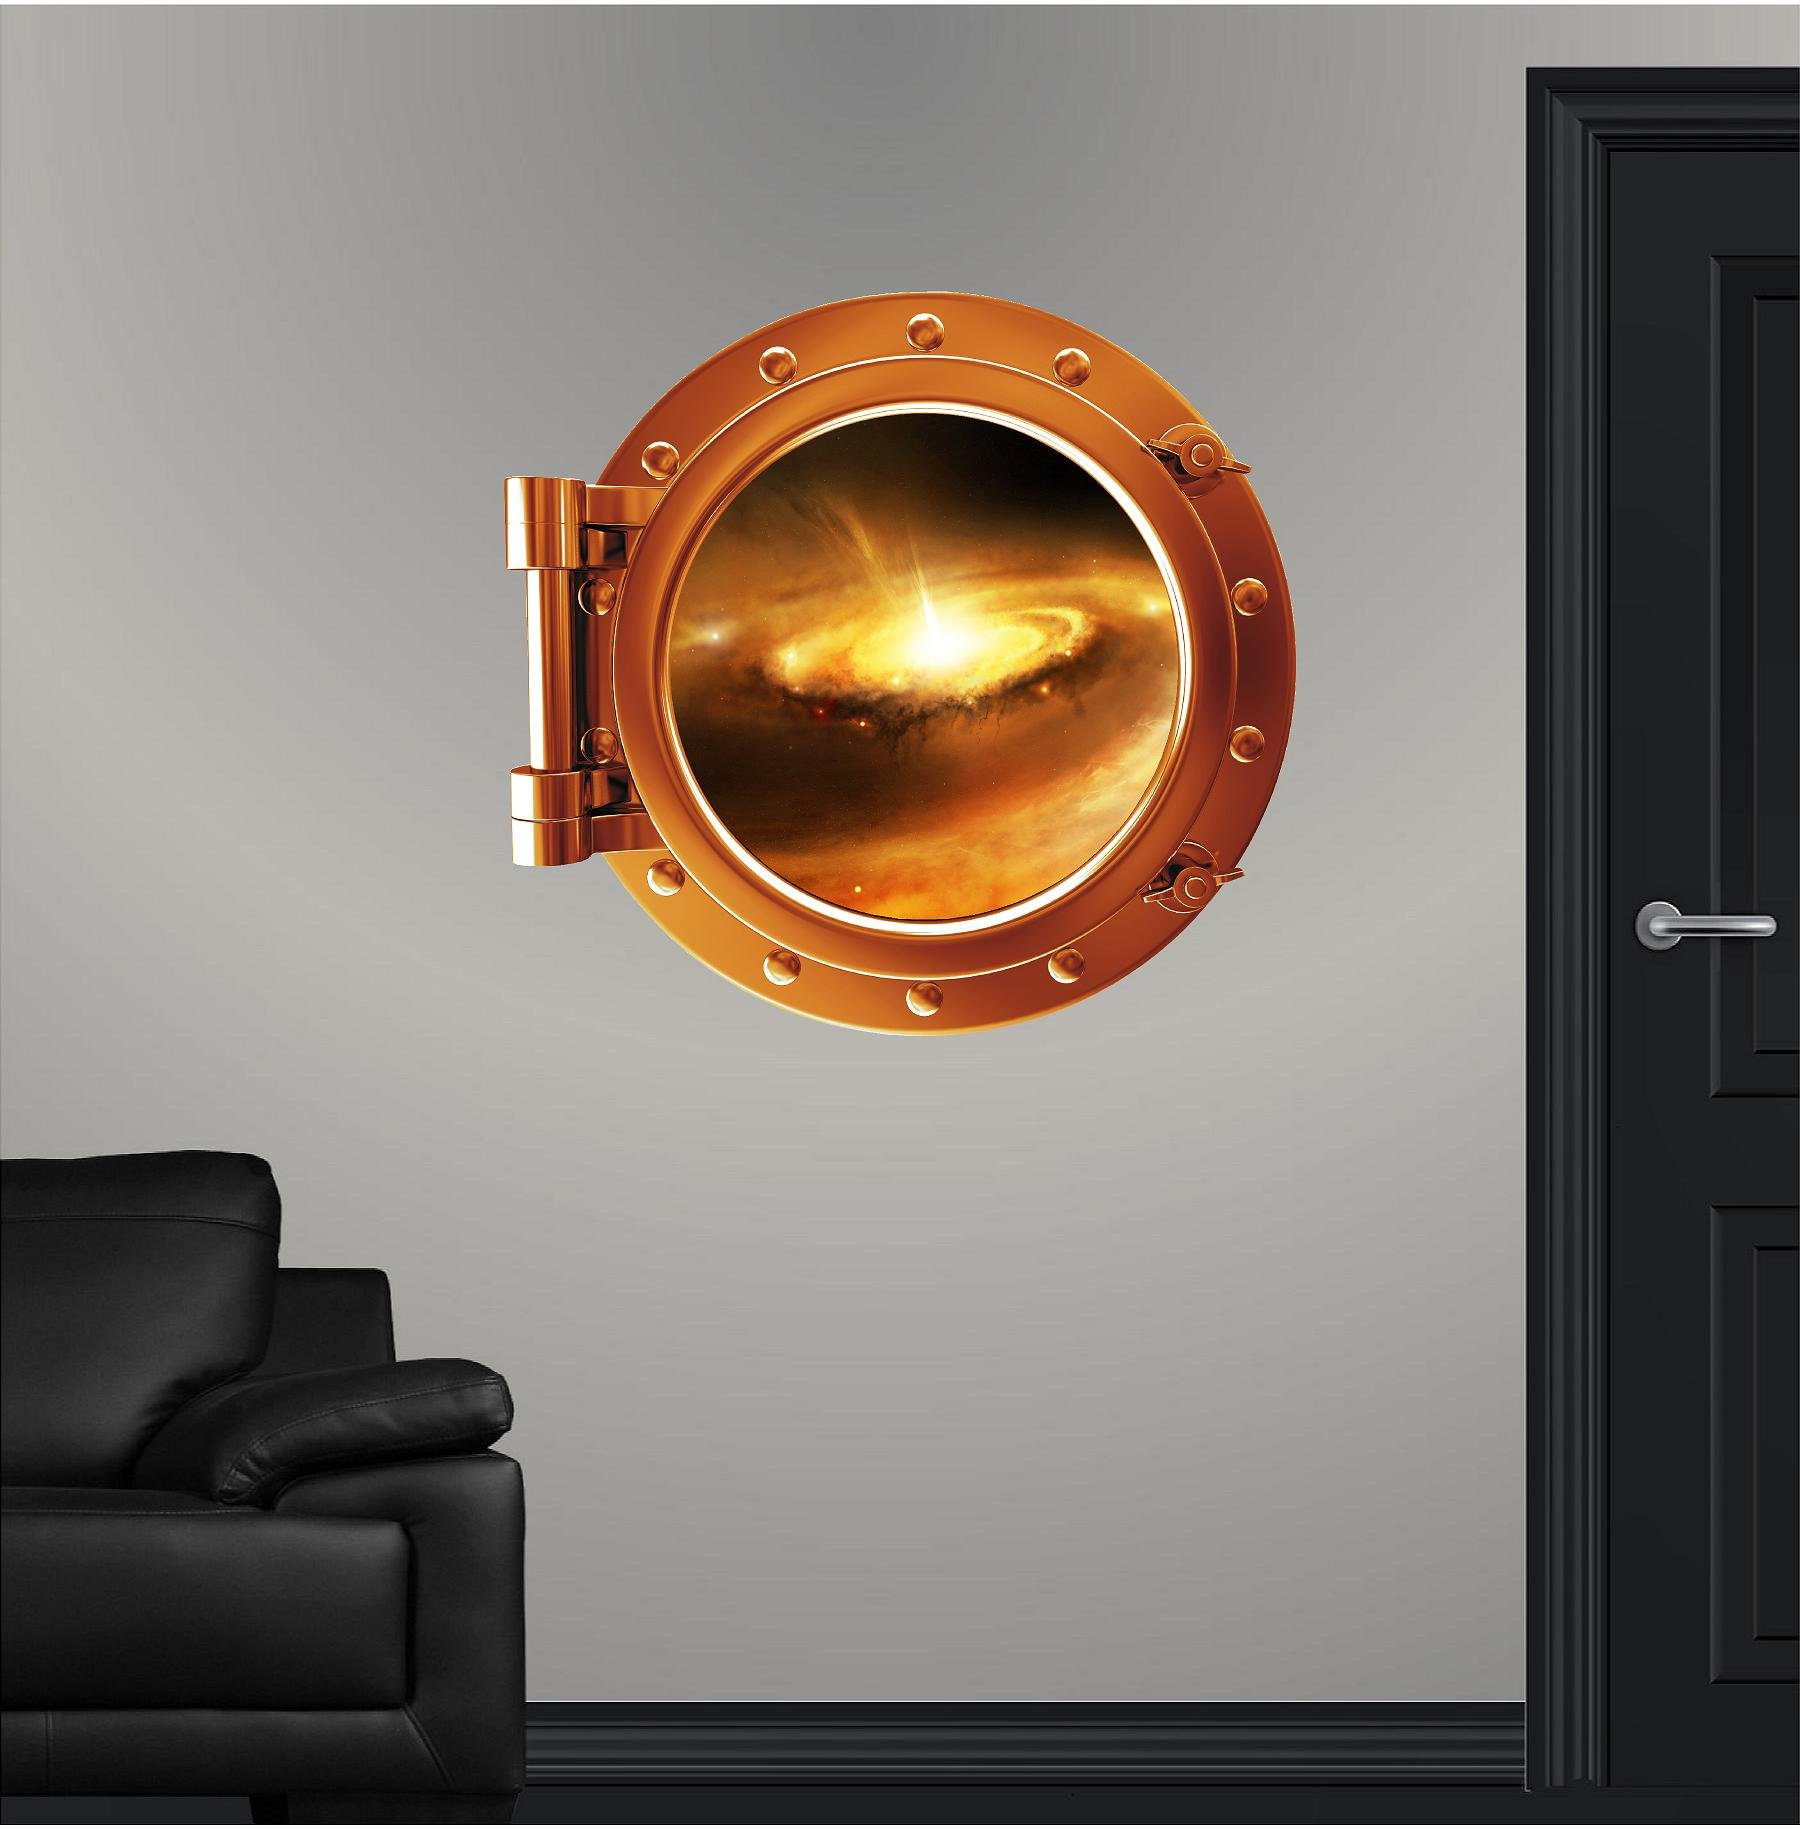 24'' COLORED PORTSCAPE Orange Instant Space Ship Window View STELLAR NURSERY #1 Porthole Graphic Sticker Children Mural